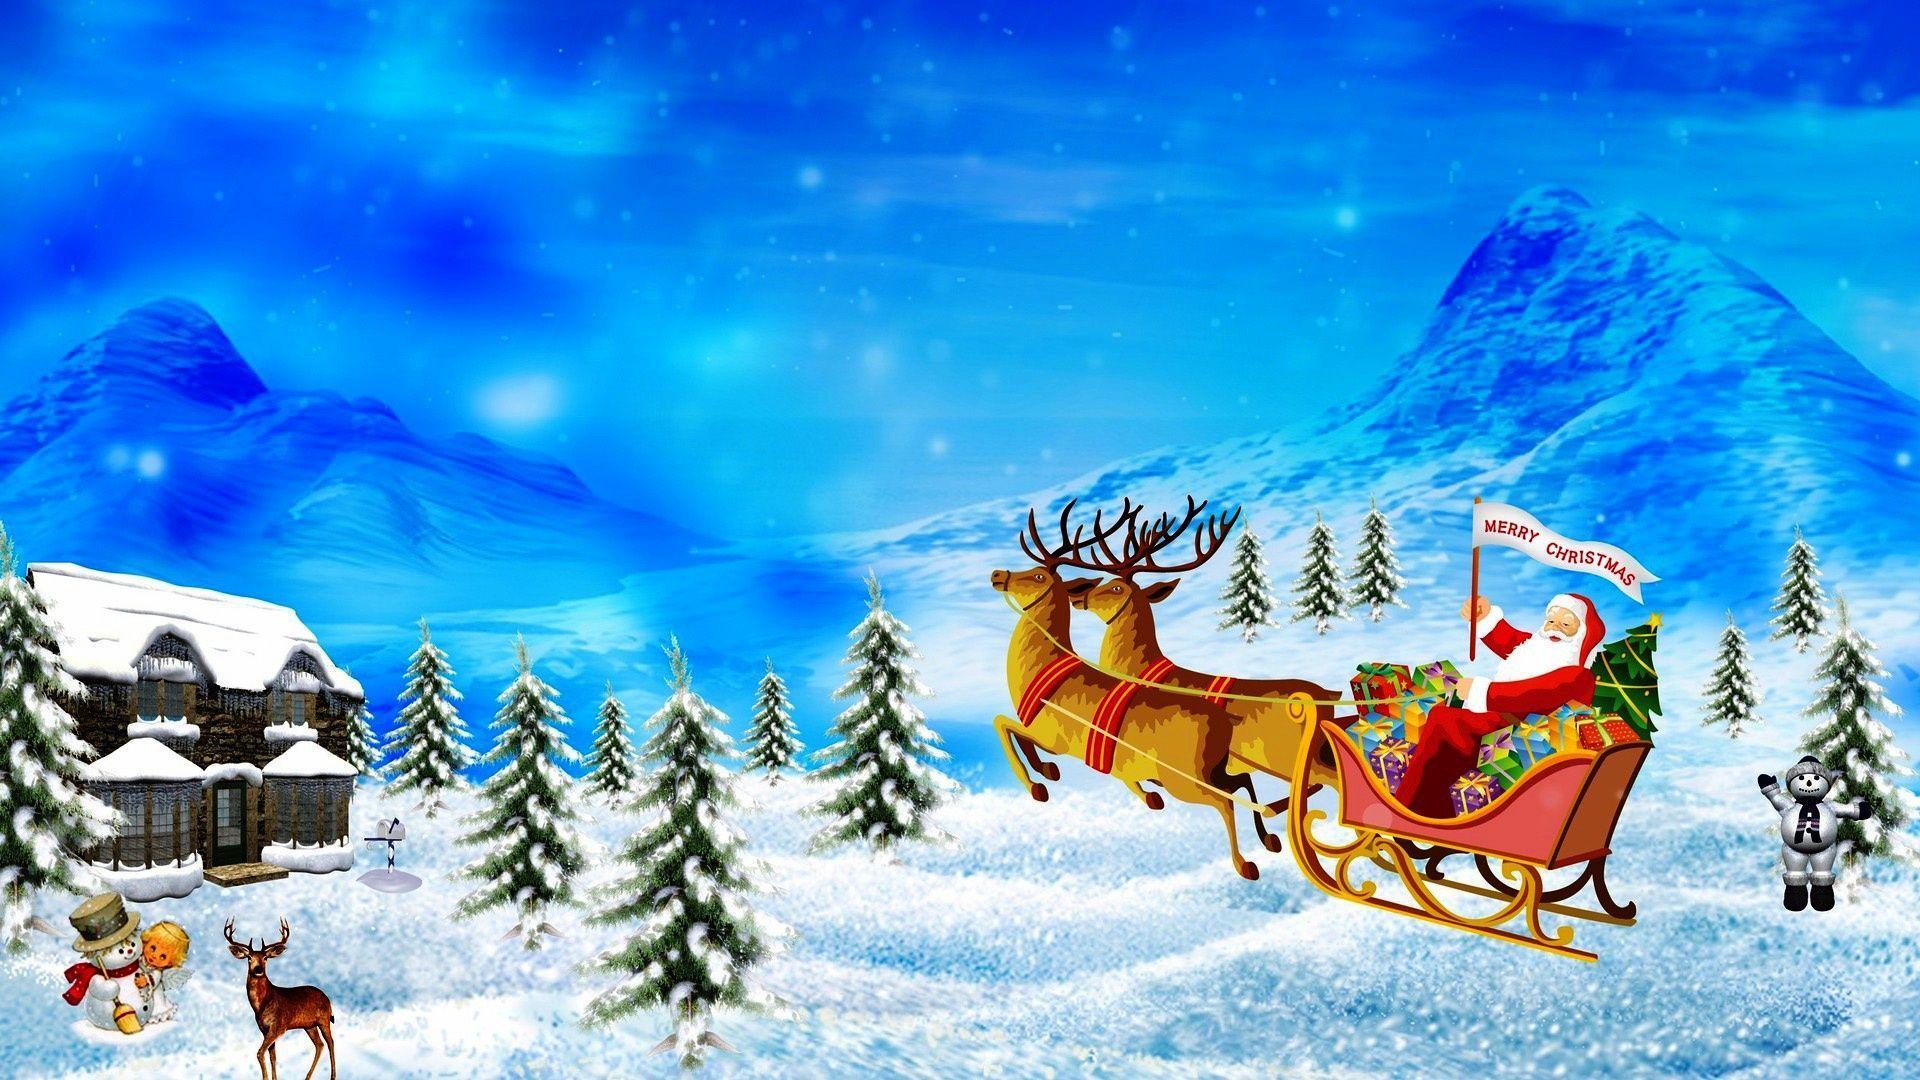 Merry-Christmas-Wallpapers-2014-3.jpg